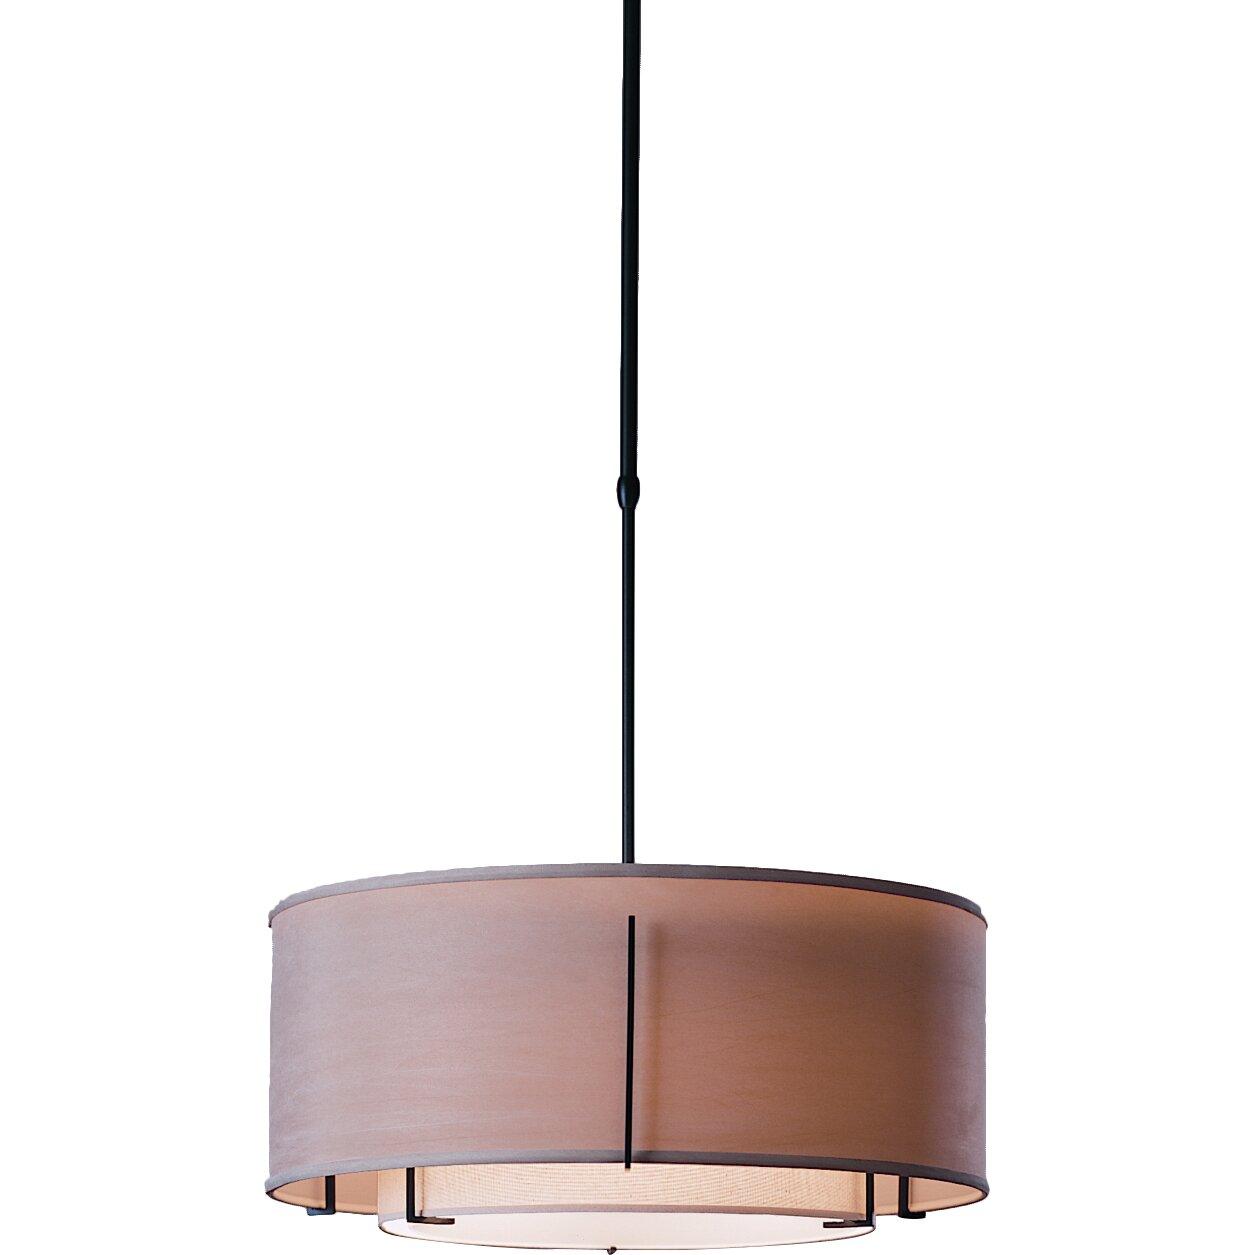 Hubbardton Forge Lamp Shades: Hubbardton Forge Exos Double Shade 3 Light Drum Pendant